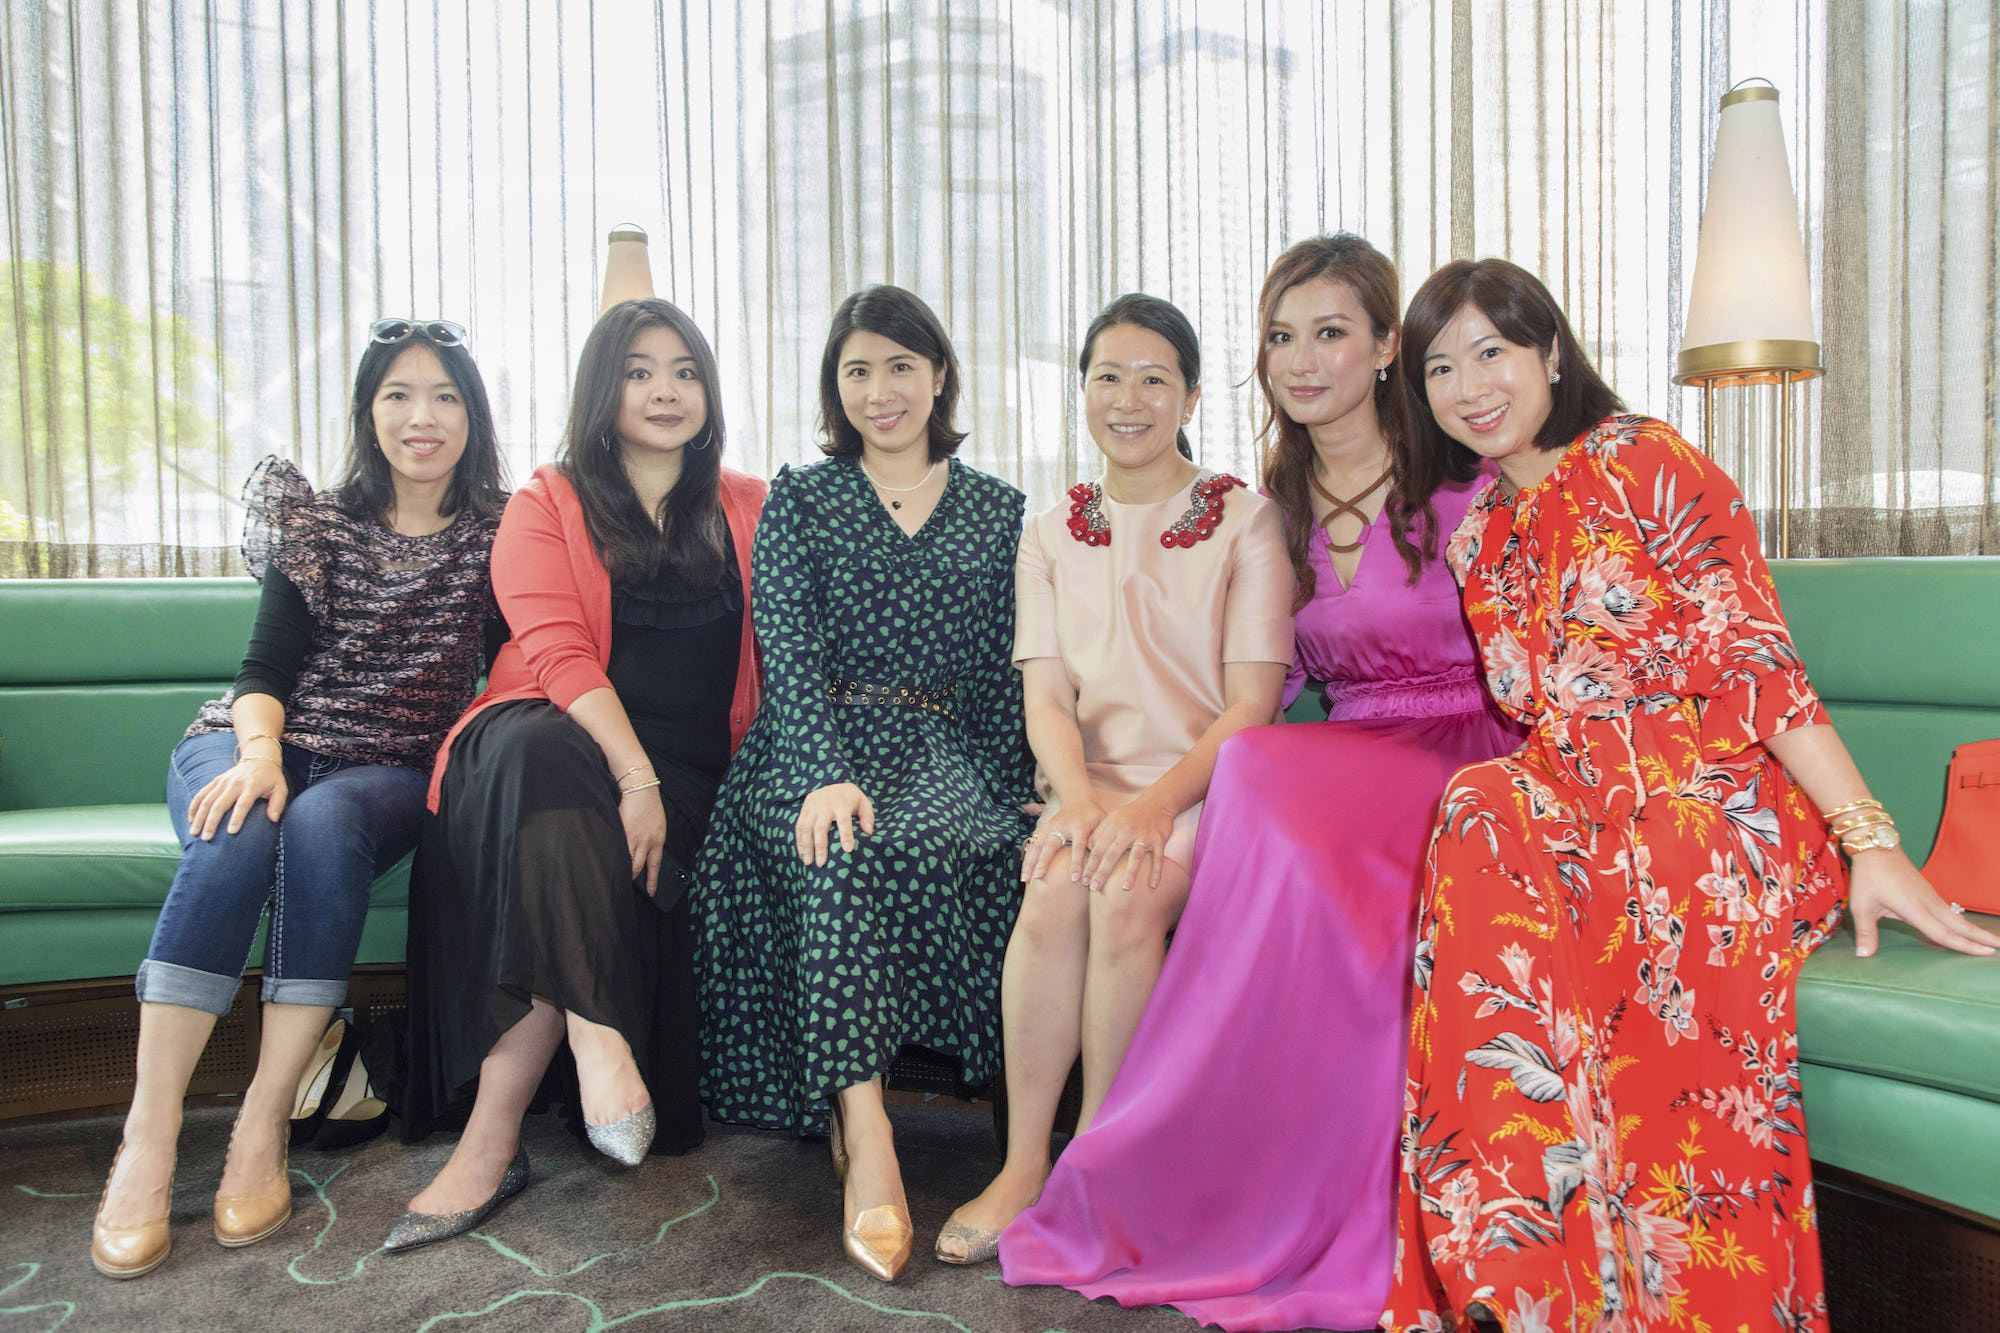 Alina Huo-Knothe, Vena Cheng, Samanta Pong-Lau, Amy Wong, Colleen Fung, Leanne Lu-Chu